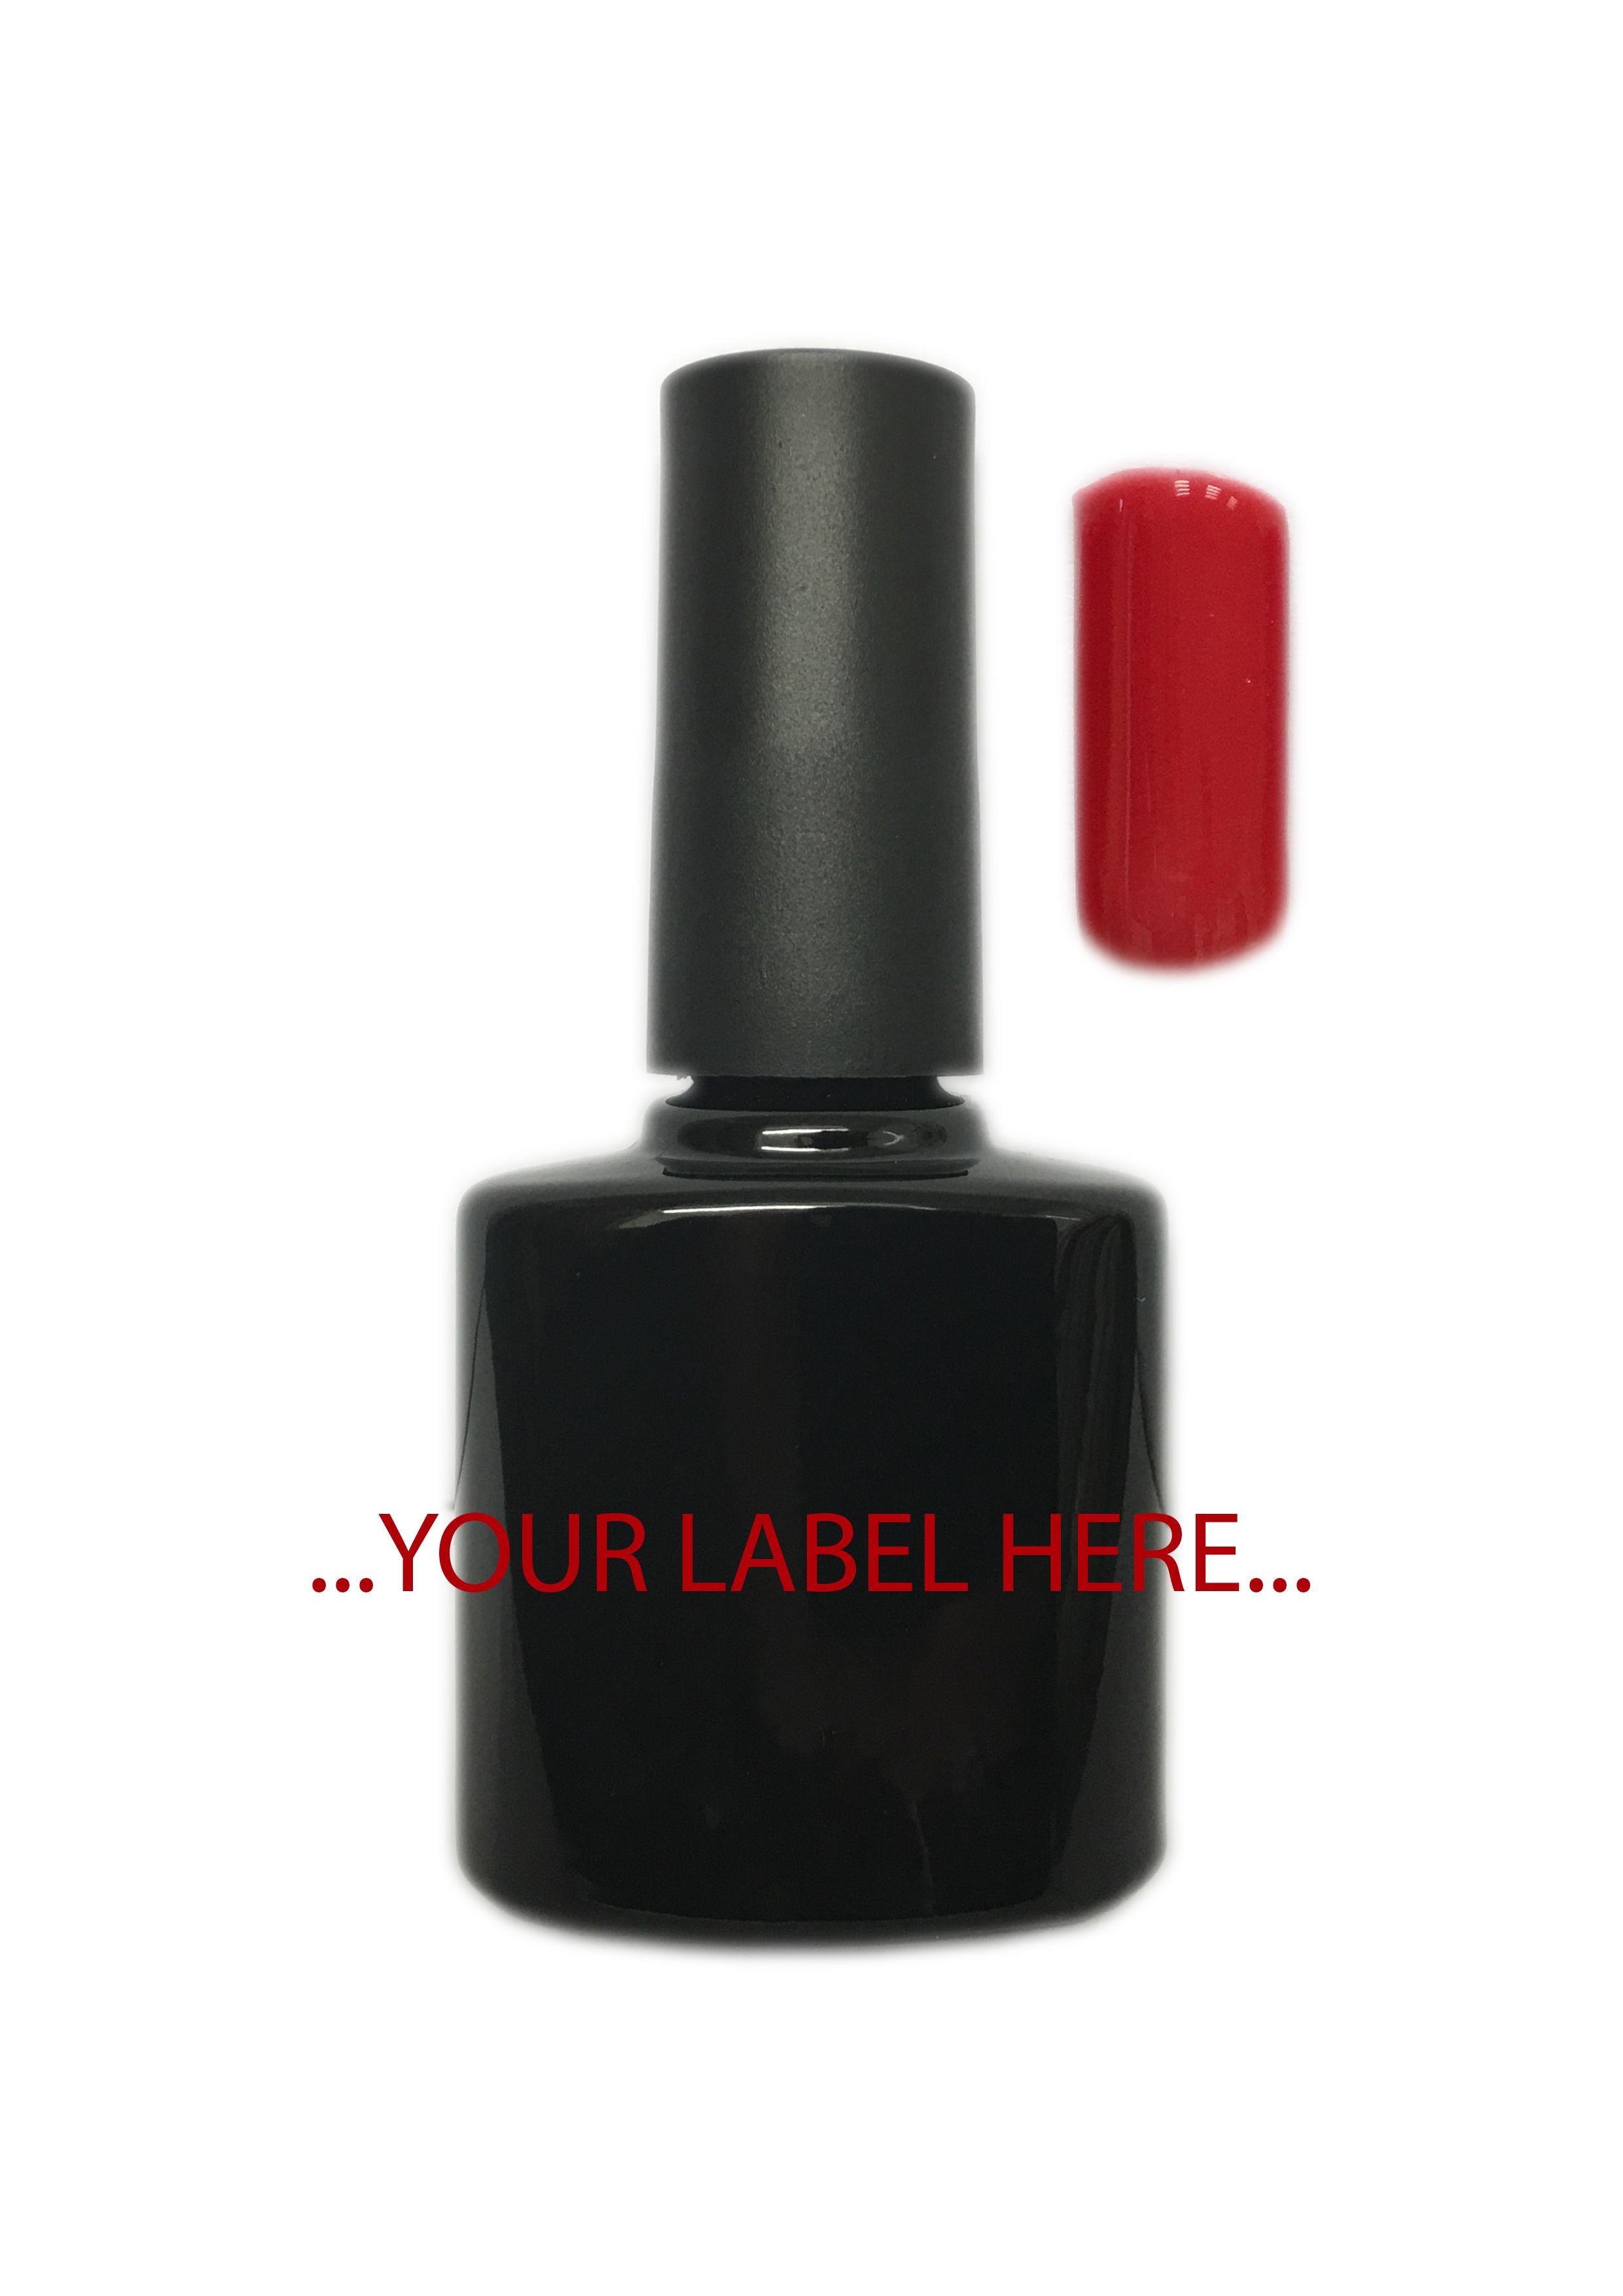 Porsche Red UV Gel. UV, Gel, Nails, Nail, UV Lamp, CosmetUK,  Matte Top Coat, Peelable Base Coat, No Wipe Top Coat, Hand, Hands, Fingers, Finger. www.cosmetuk.com